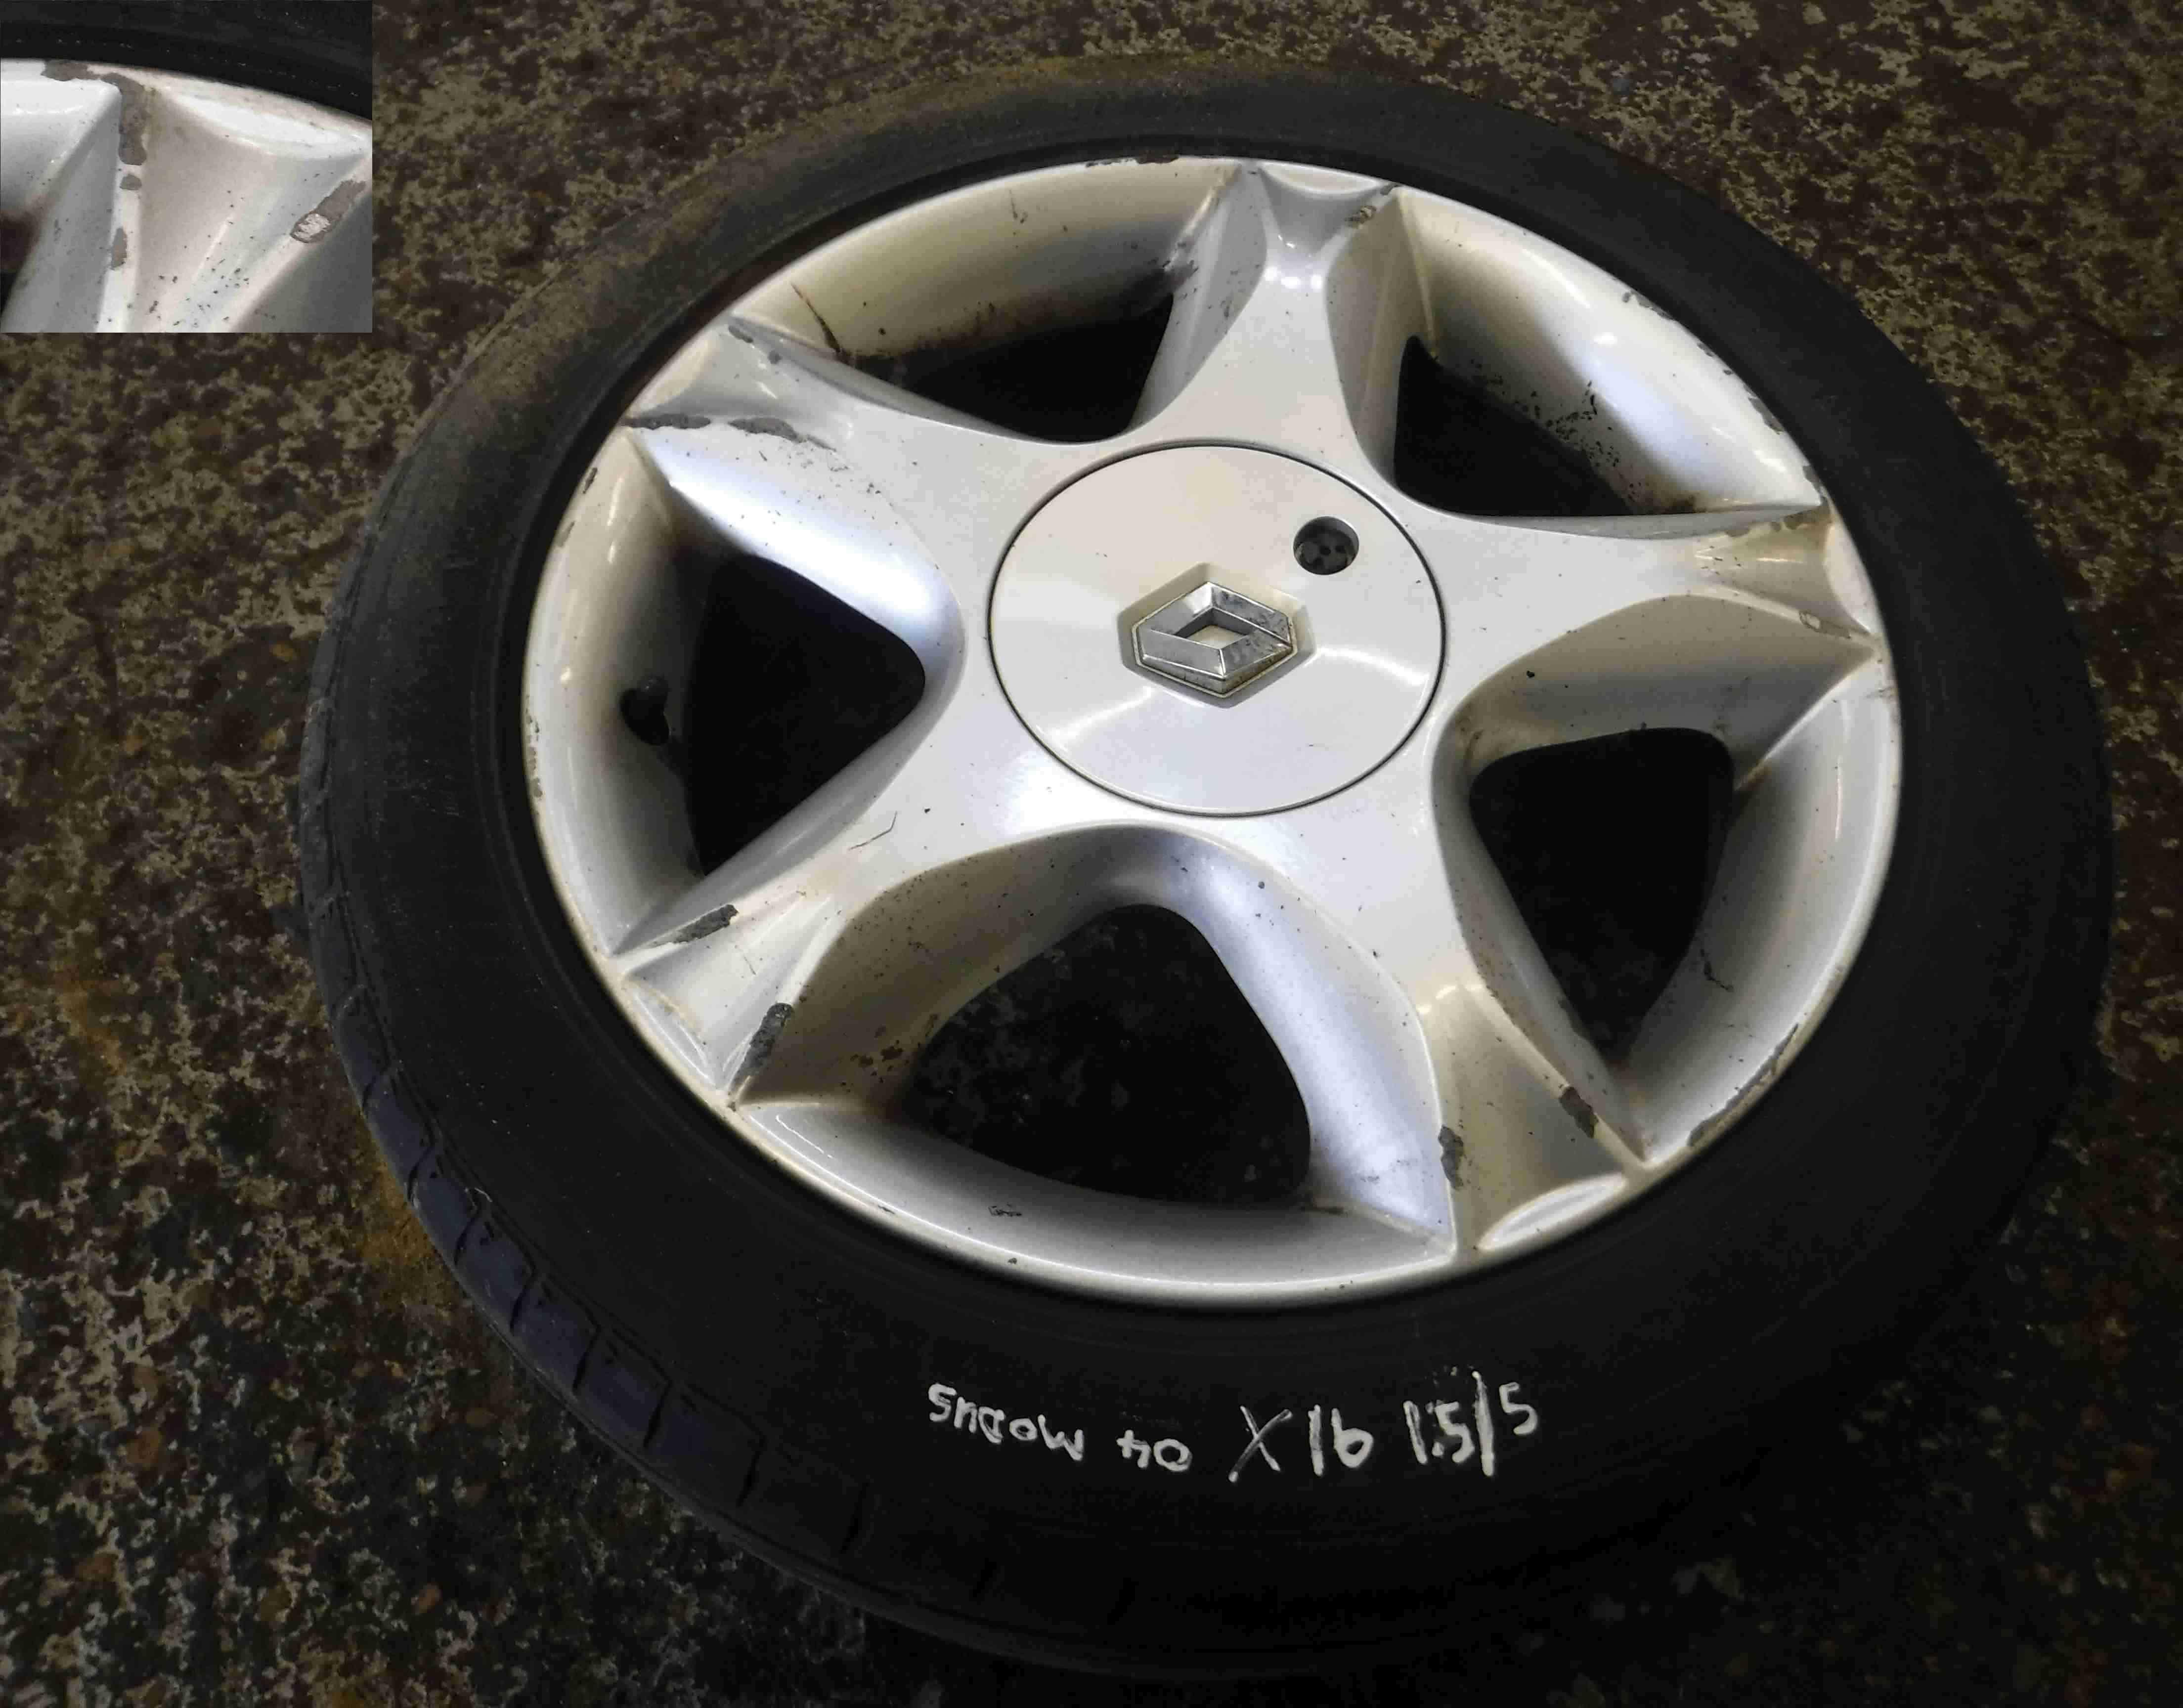 Renault Modus 2004-2008 Riveo Alloy Wheel 16 inch 3/5 8200232653